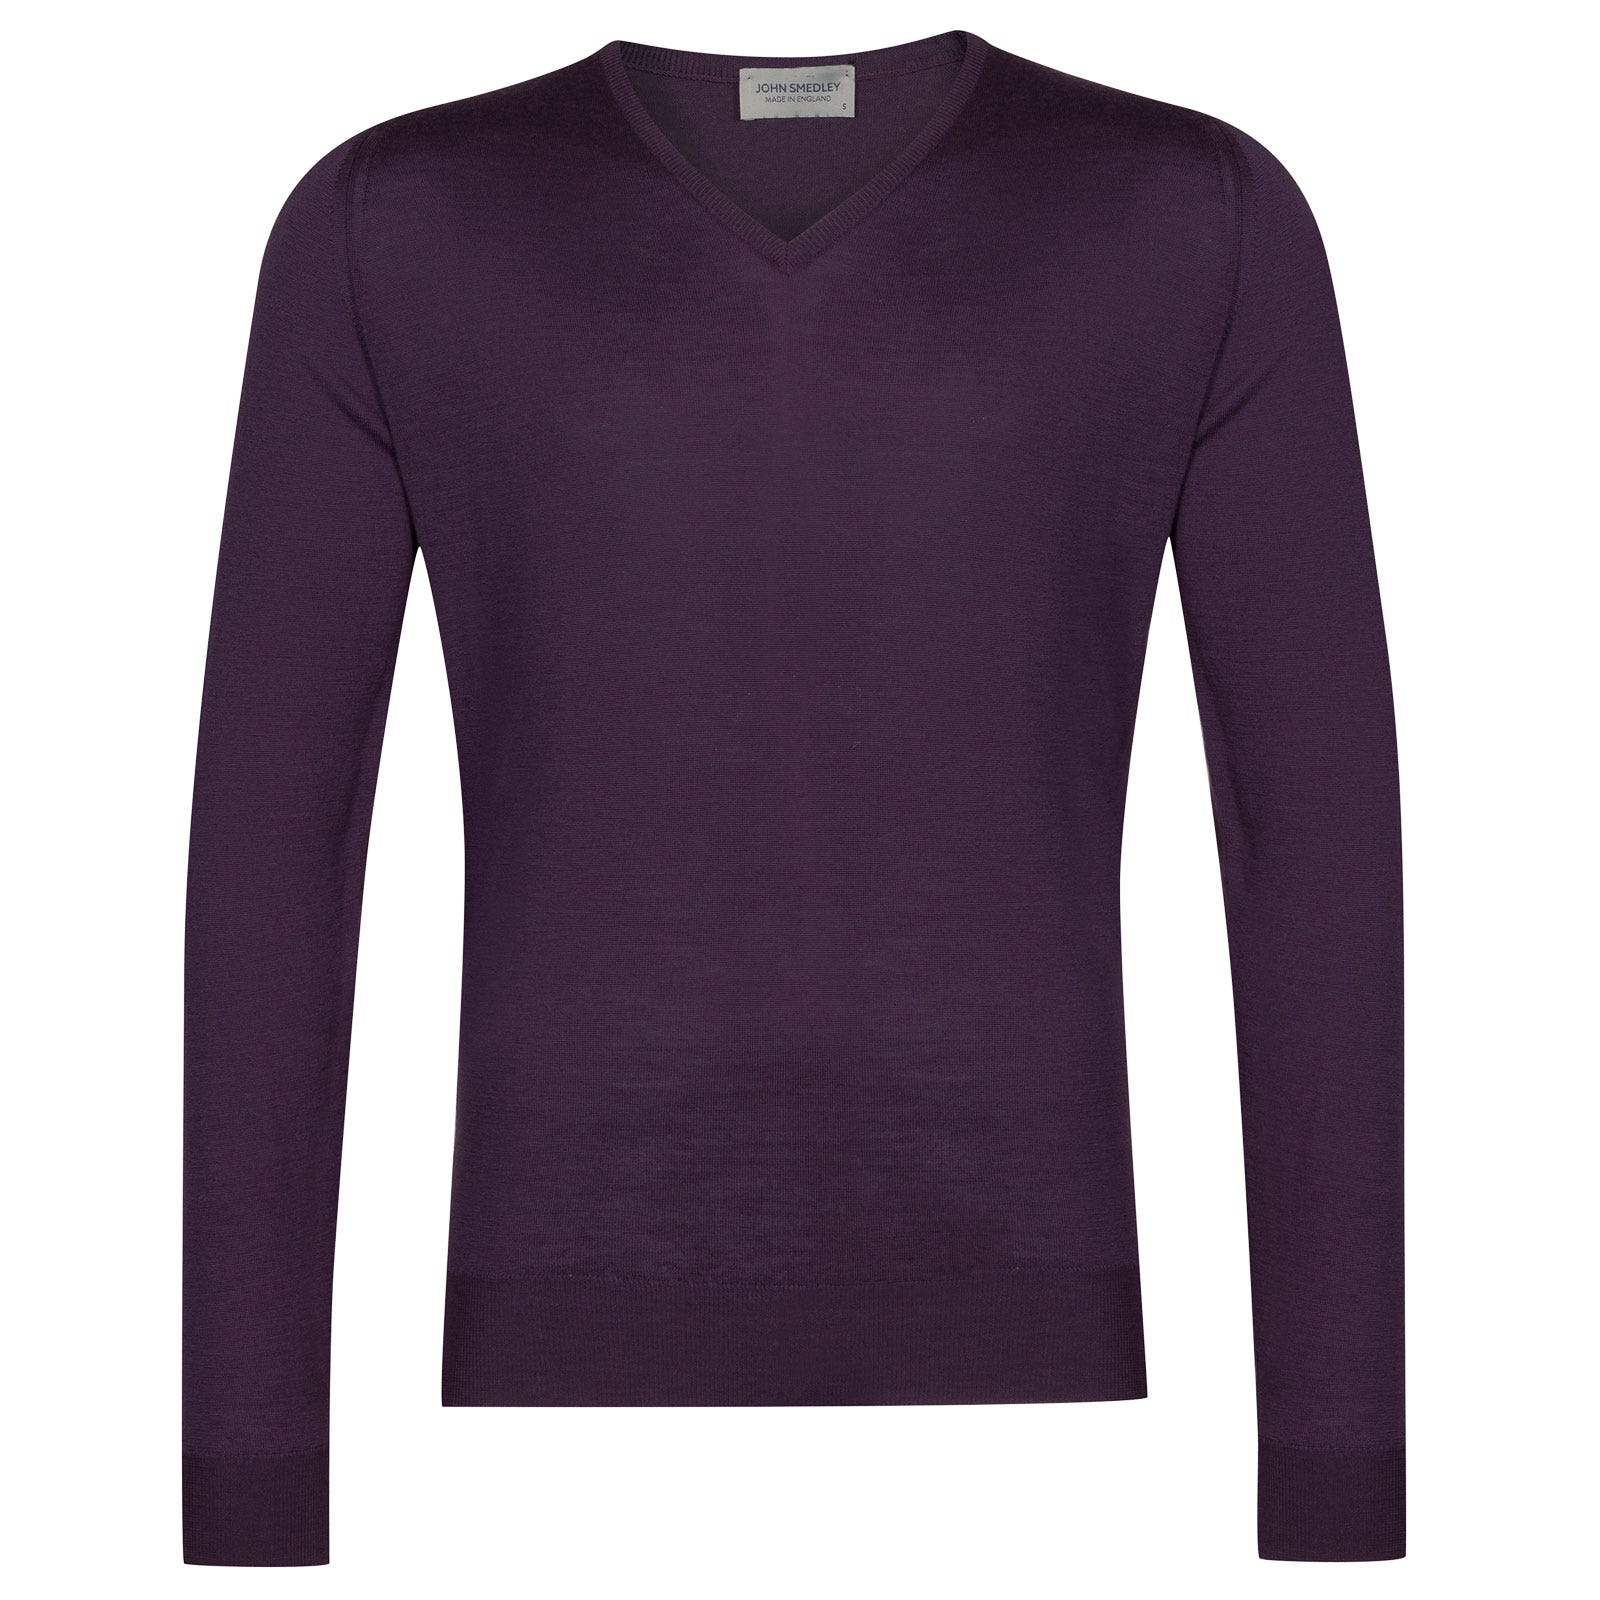 Blenheim-bauhaus-purple-L